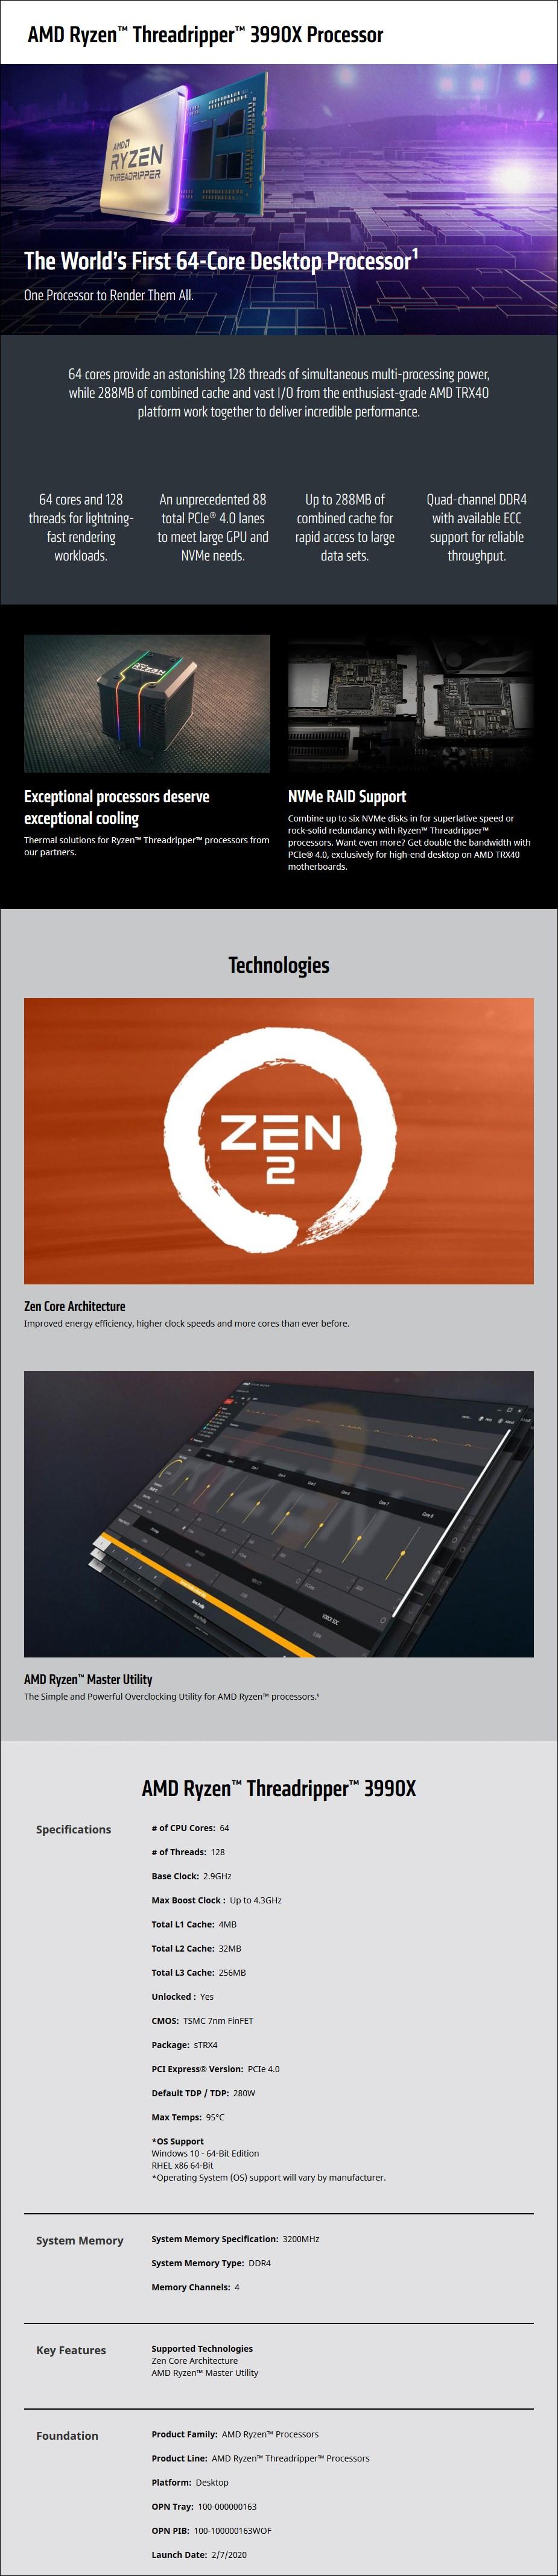 AMD Ryzen Threadripper 3990X 64-Core Socket sTRX4 2.90GHz Unlocked CPU Processor - Overview 1